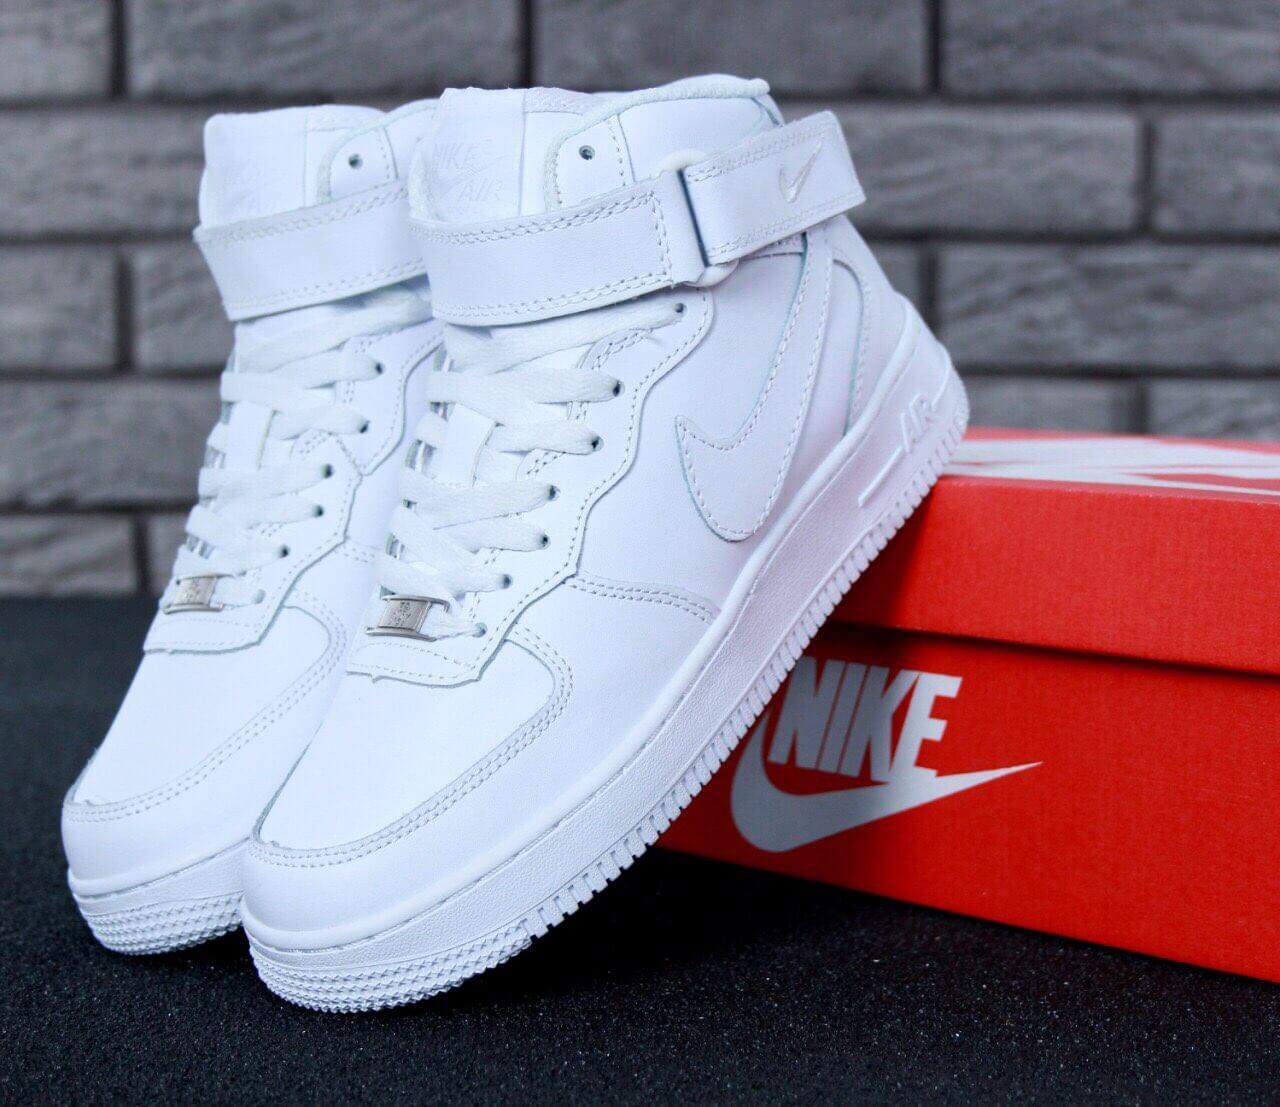 Кроссовки с мехом Nike Air Force 1 High White Winter